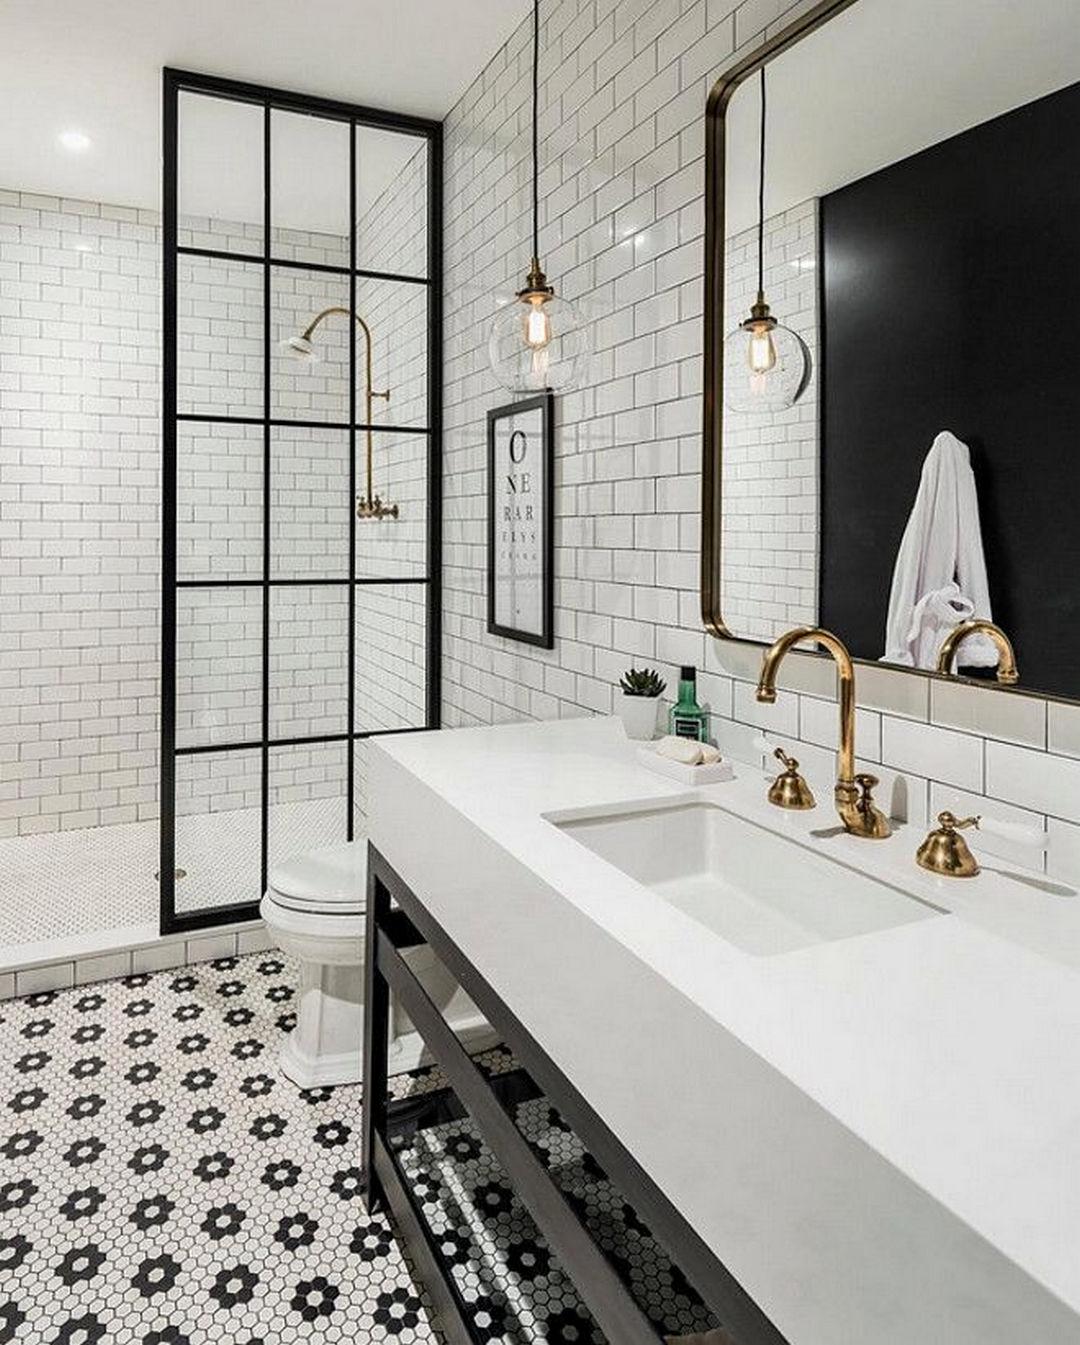 Pin By Live Local On Warwick Modern Farmhouse Bathroom White Bathroom Designs Farmhouse Bathroom Decor